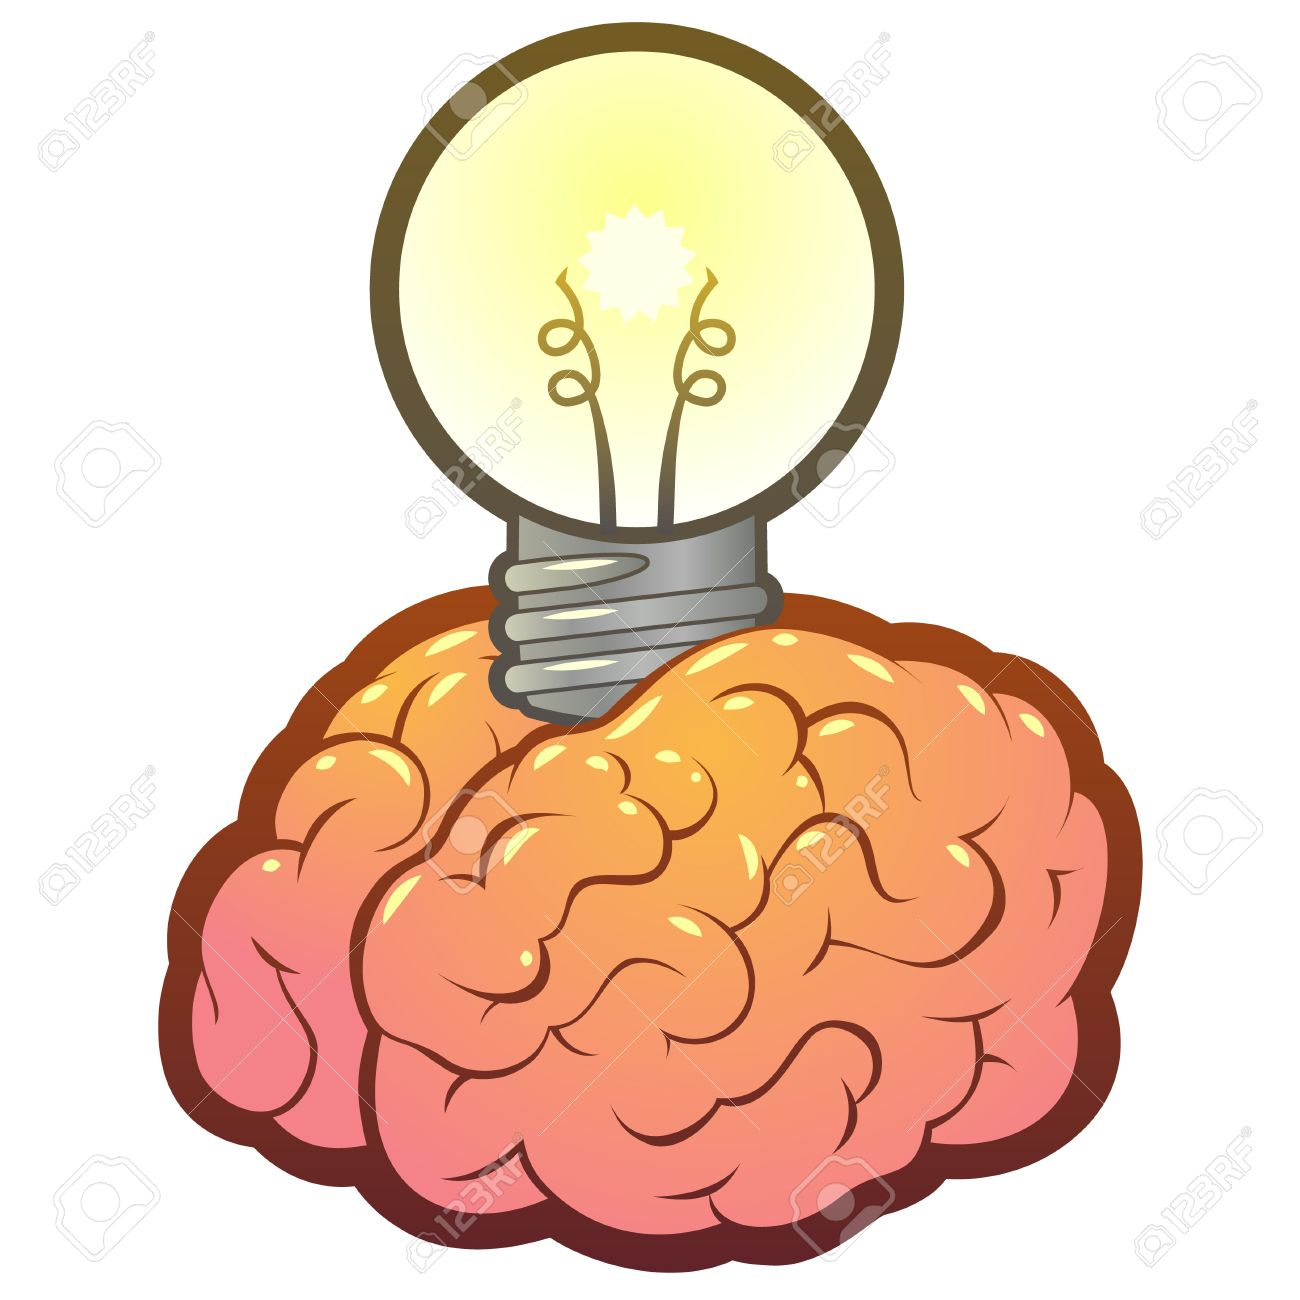 Cerveau clipart graphic Cerveau clipart 6 » Clipart Station graphic